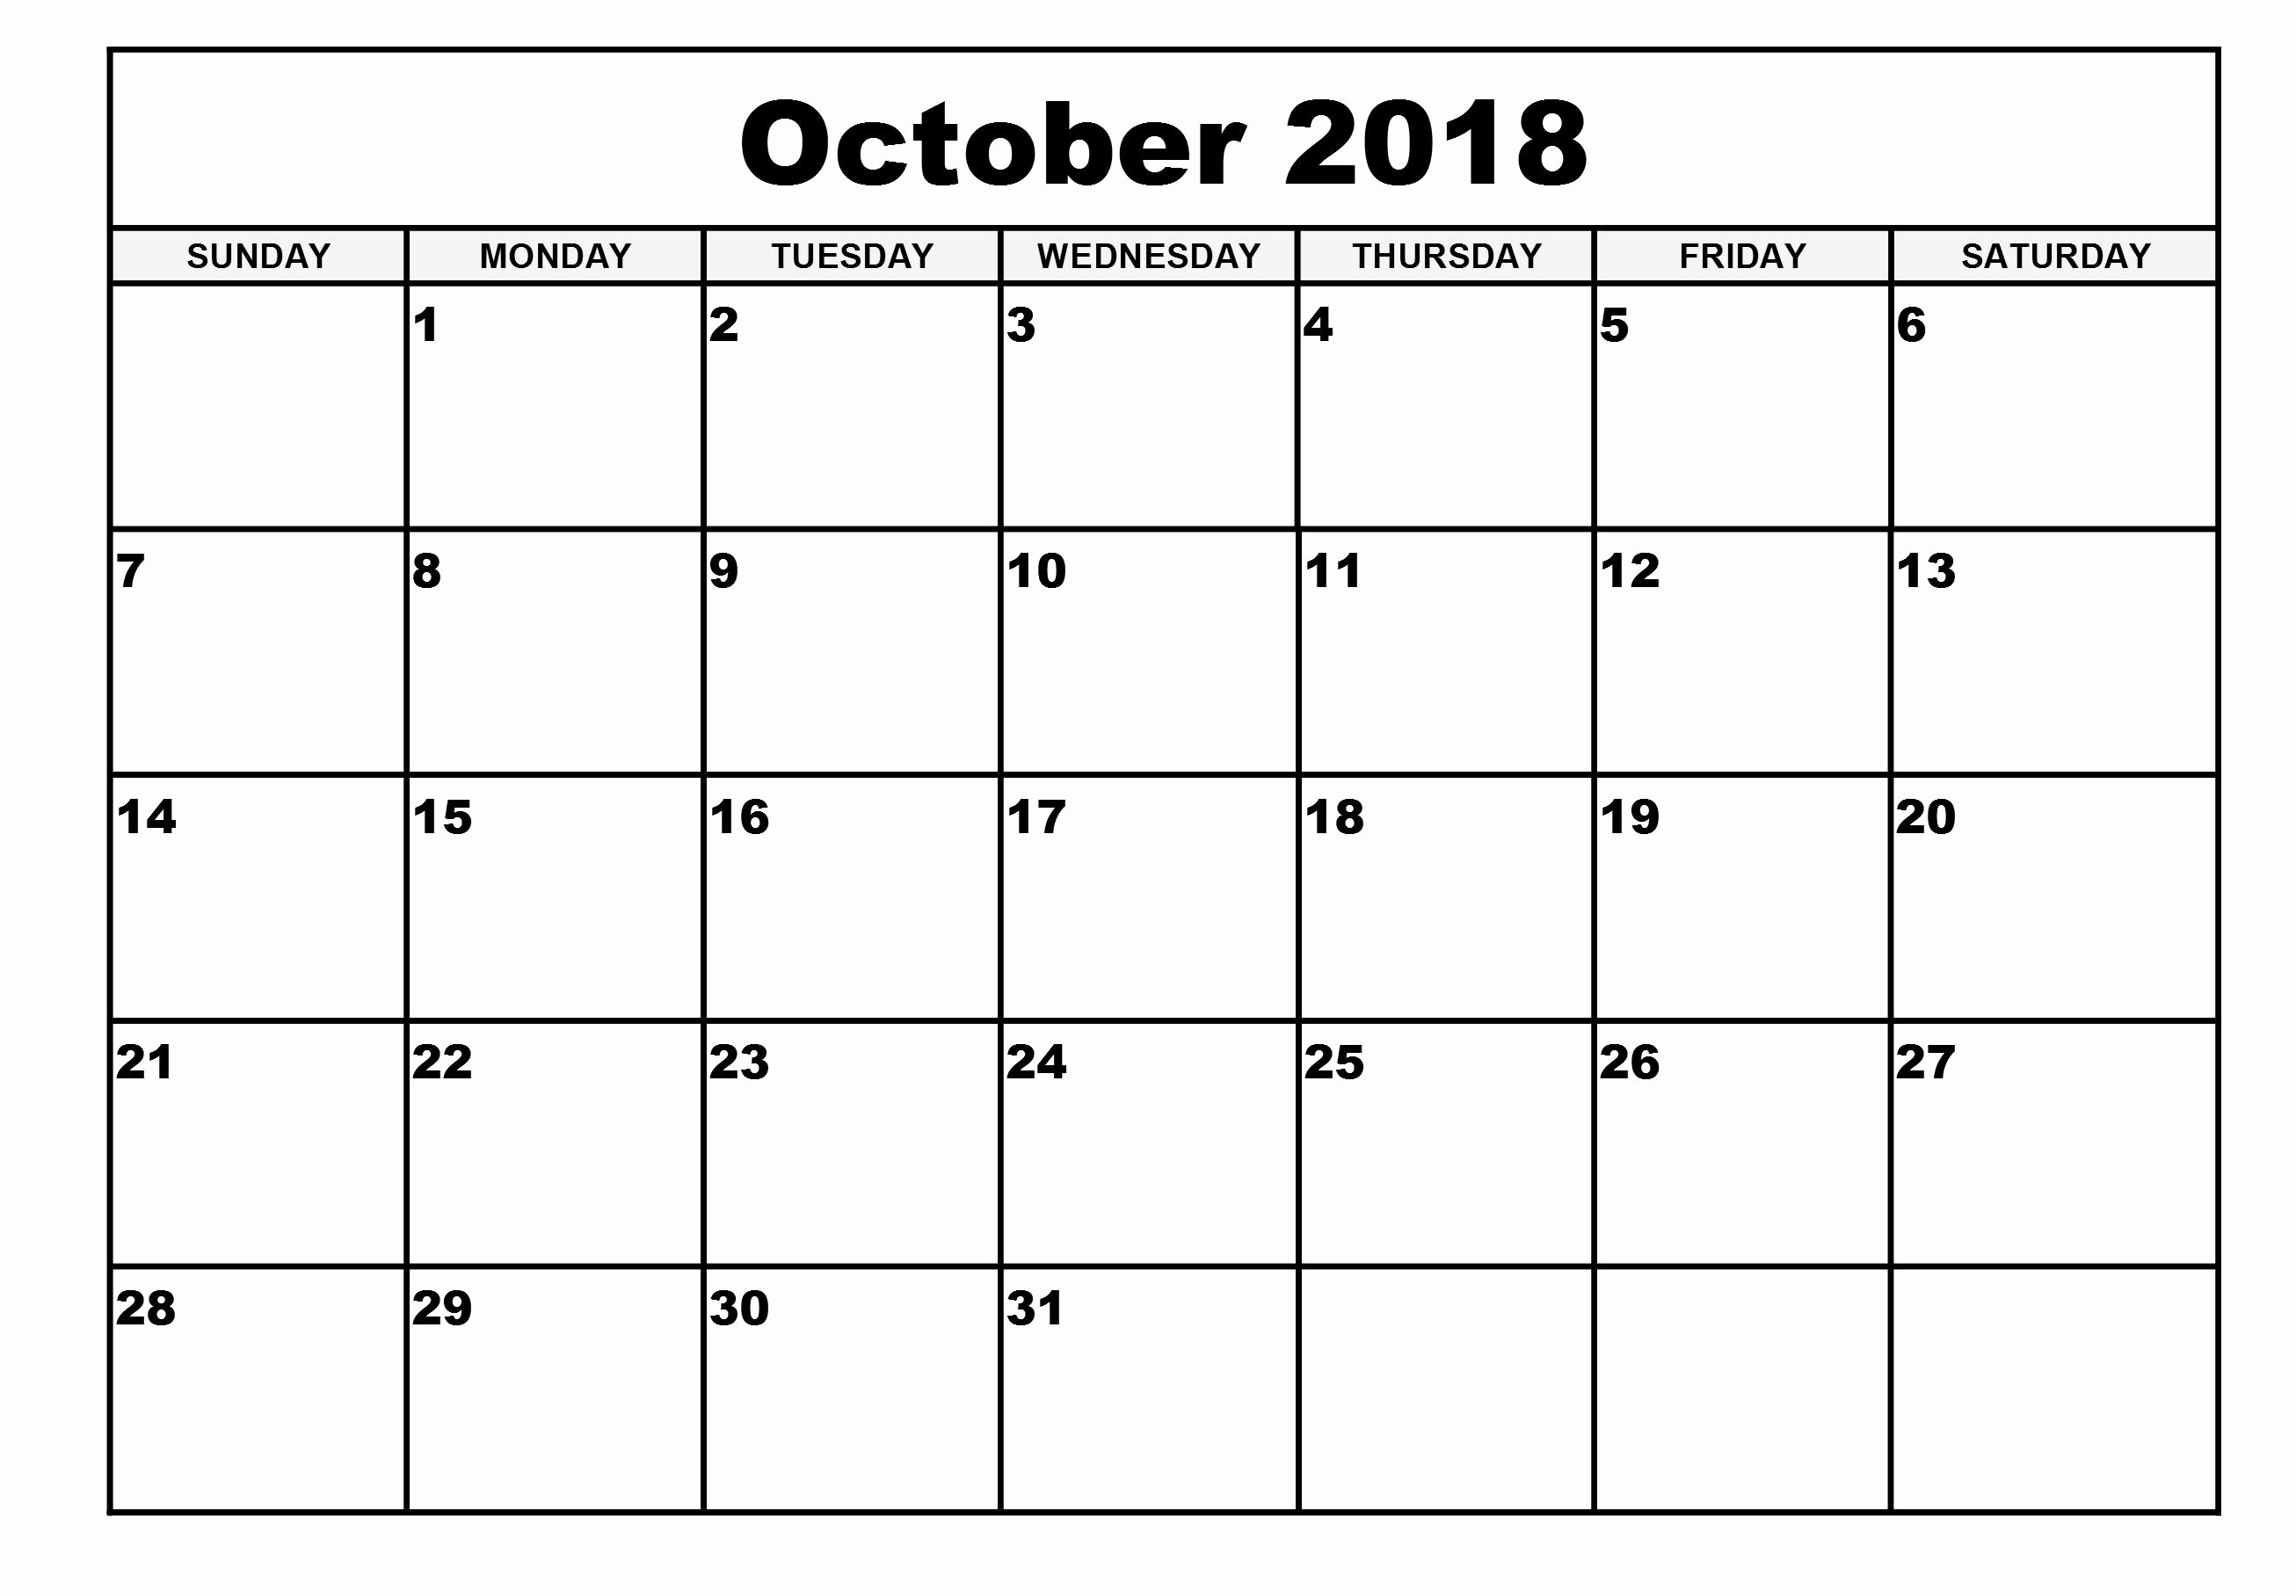 October 2018 Printable Calendar Word Luxury Quote October 2018 Calendar Printable Word Desktop